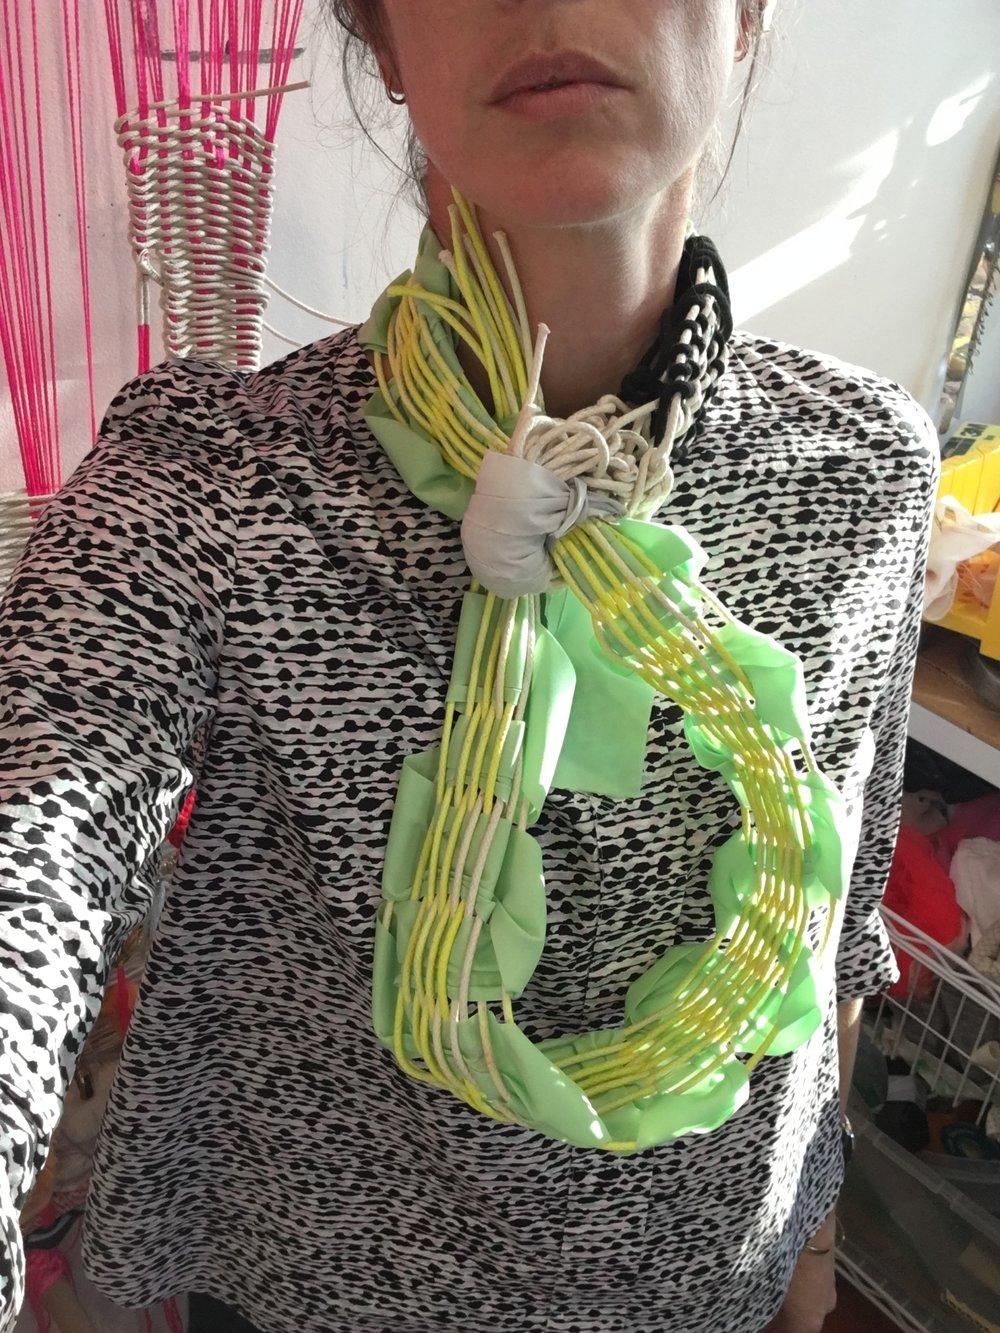 Dissent Collar #18 (seam binding, cotton rope, spray paint, thread)